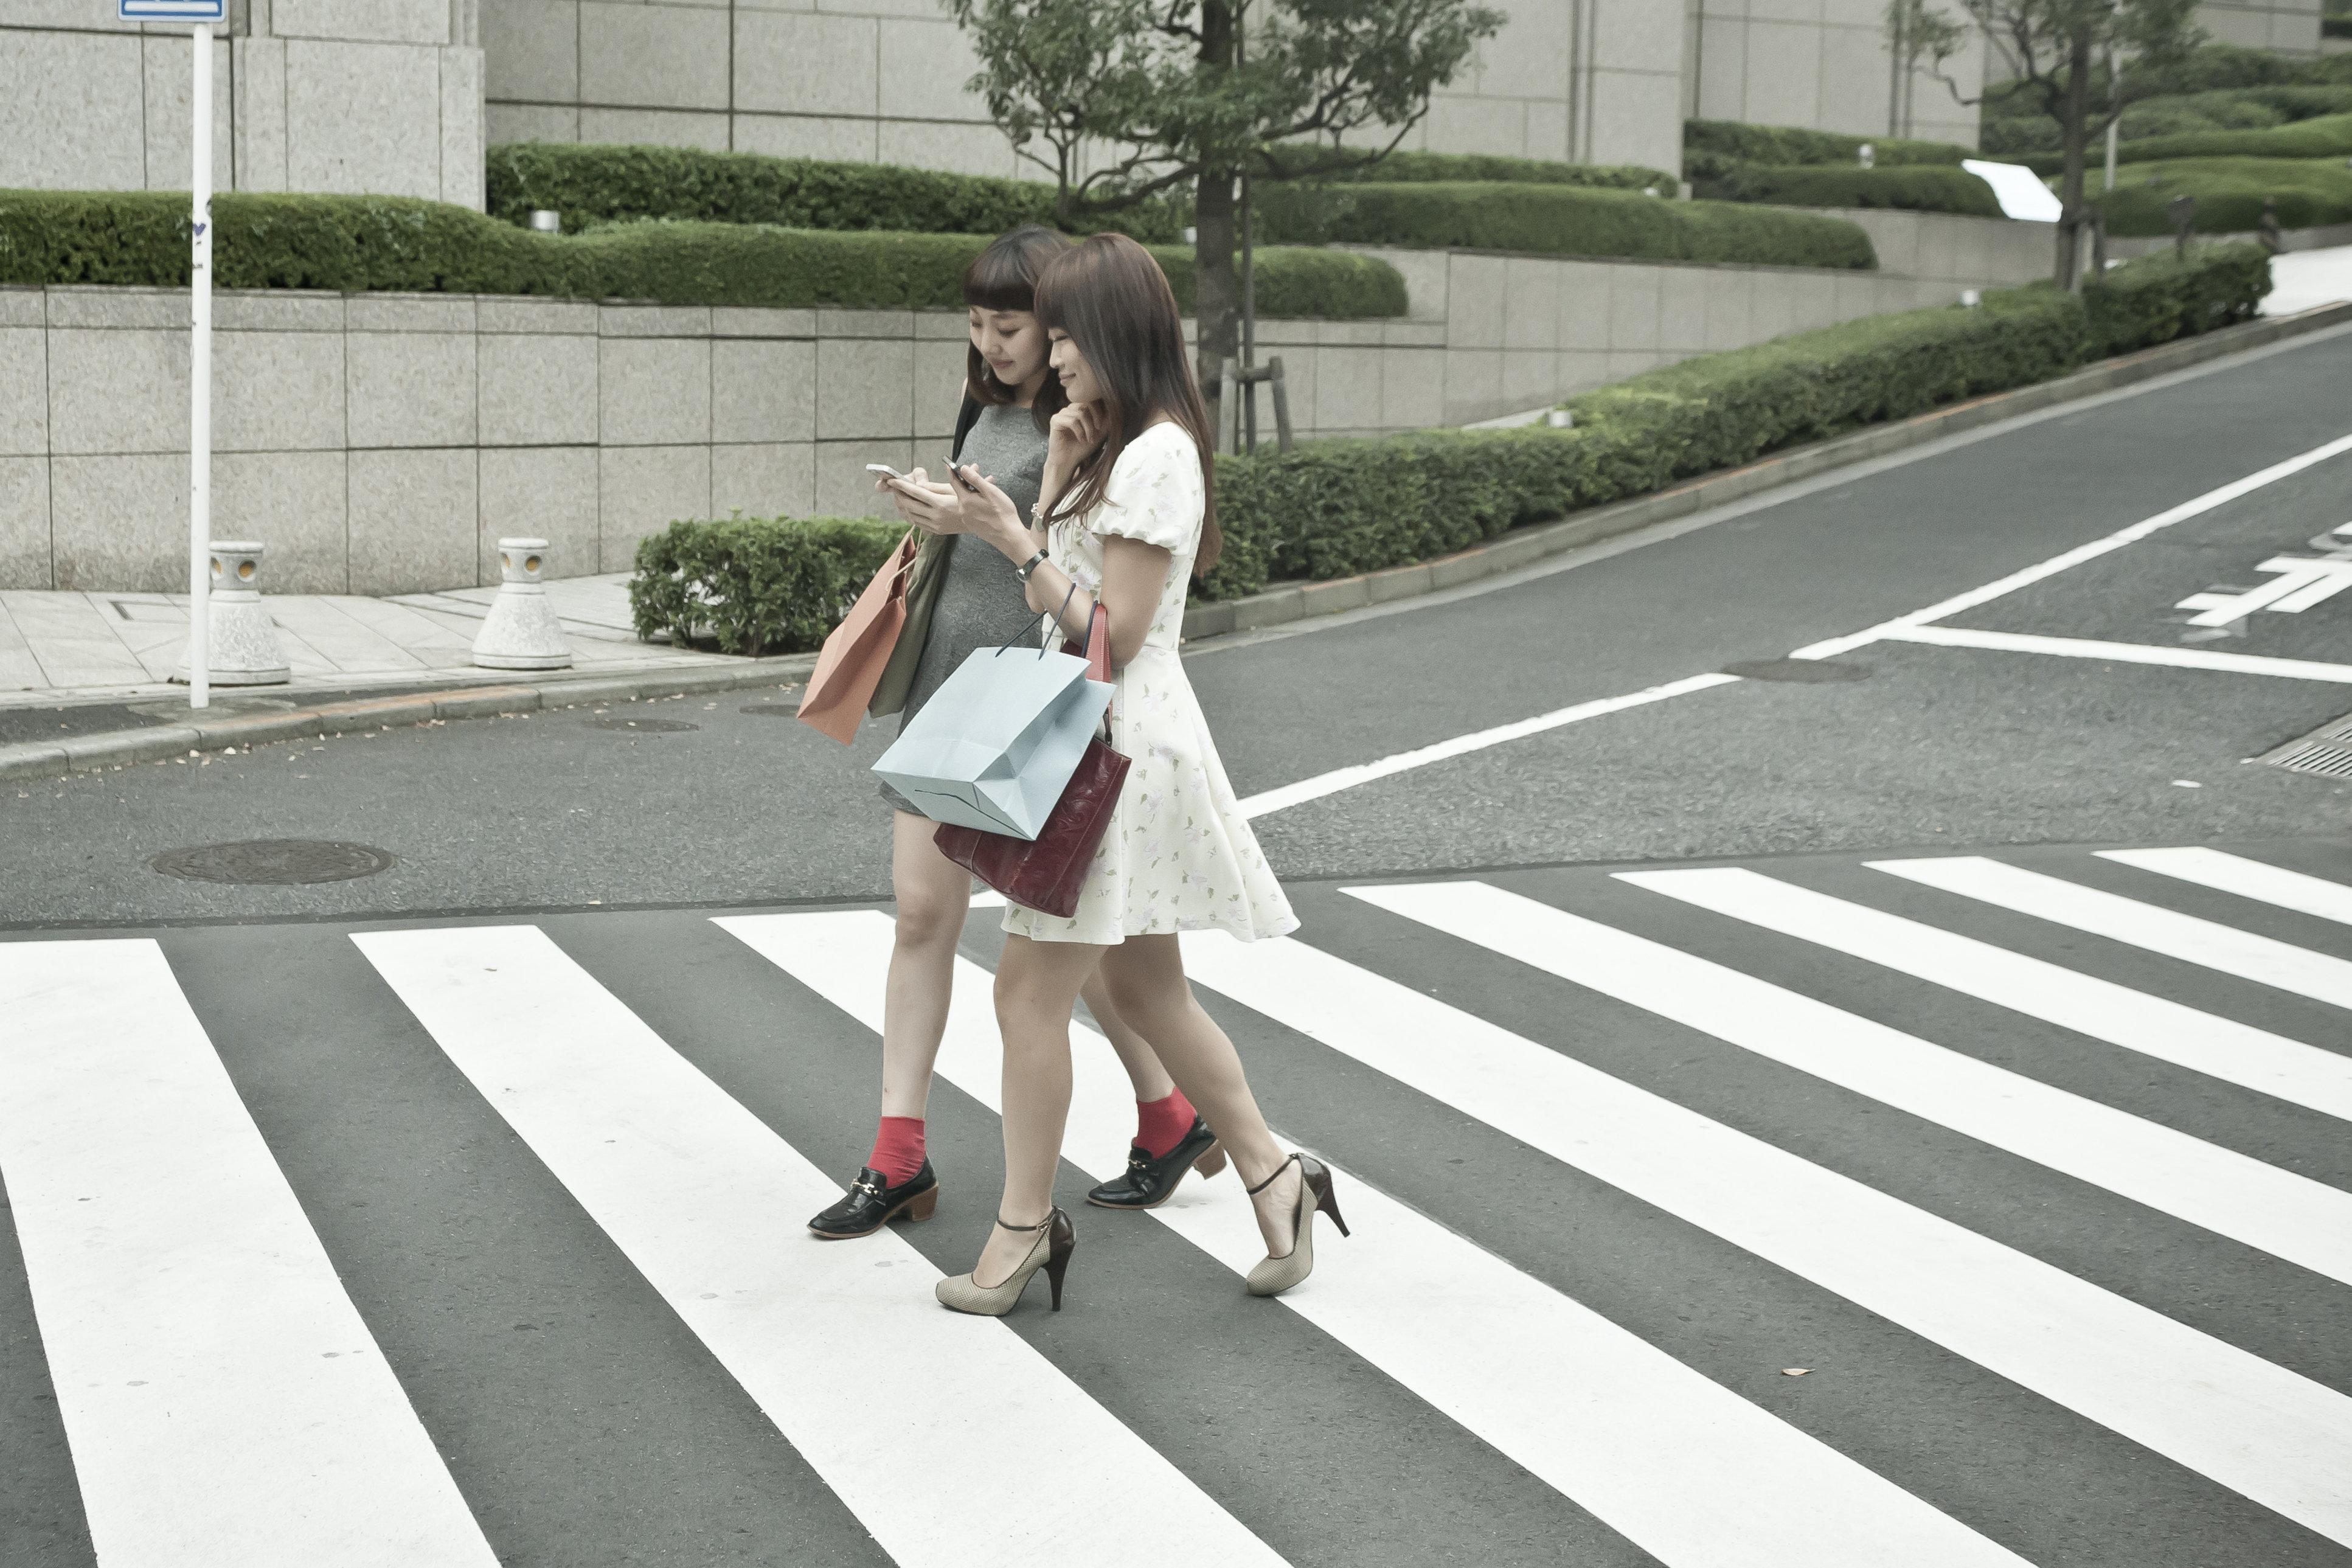 Asian women shopping,walking on street